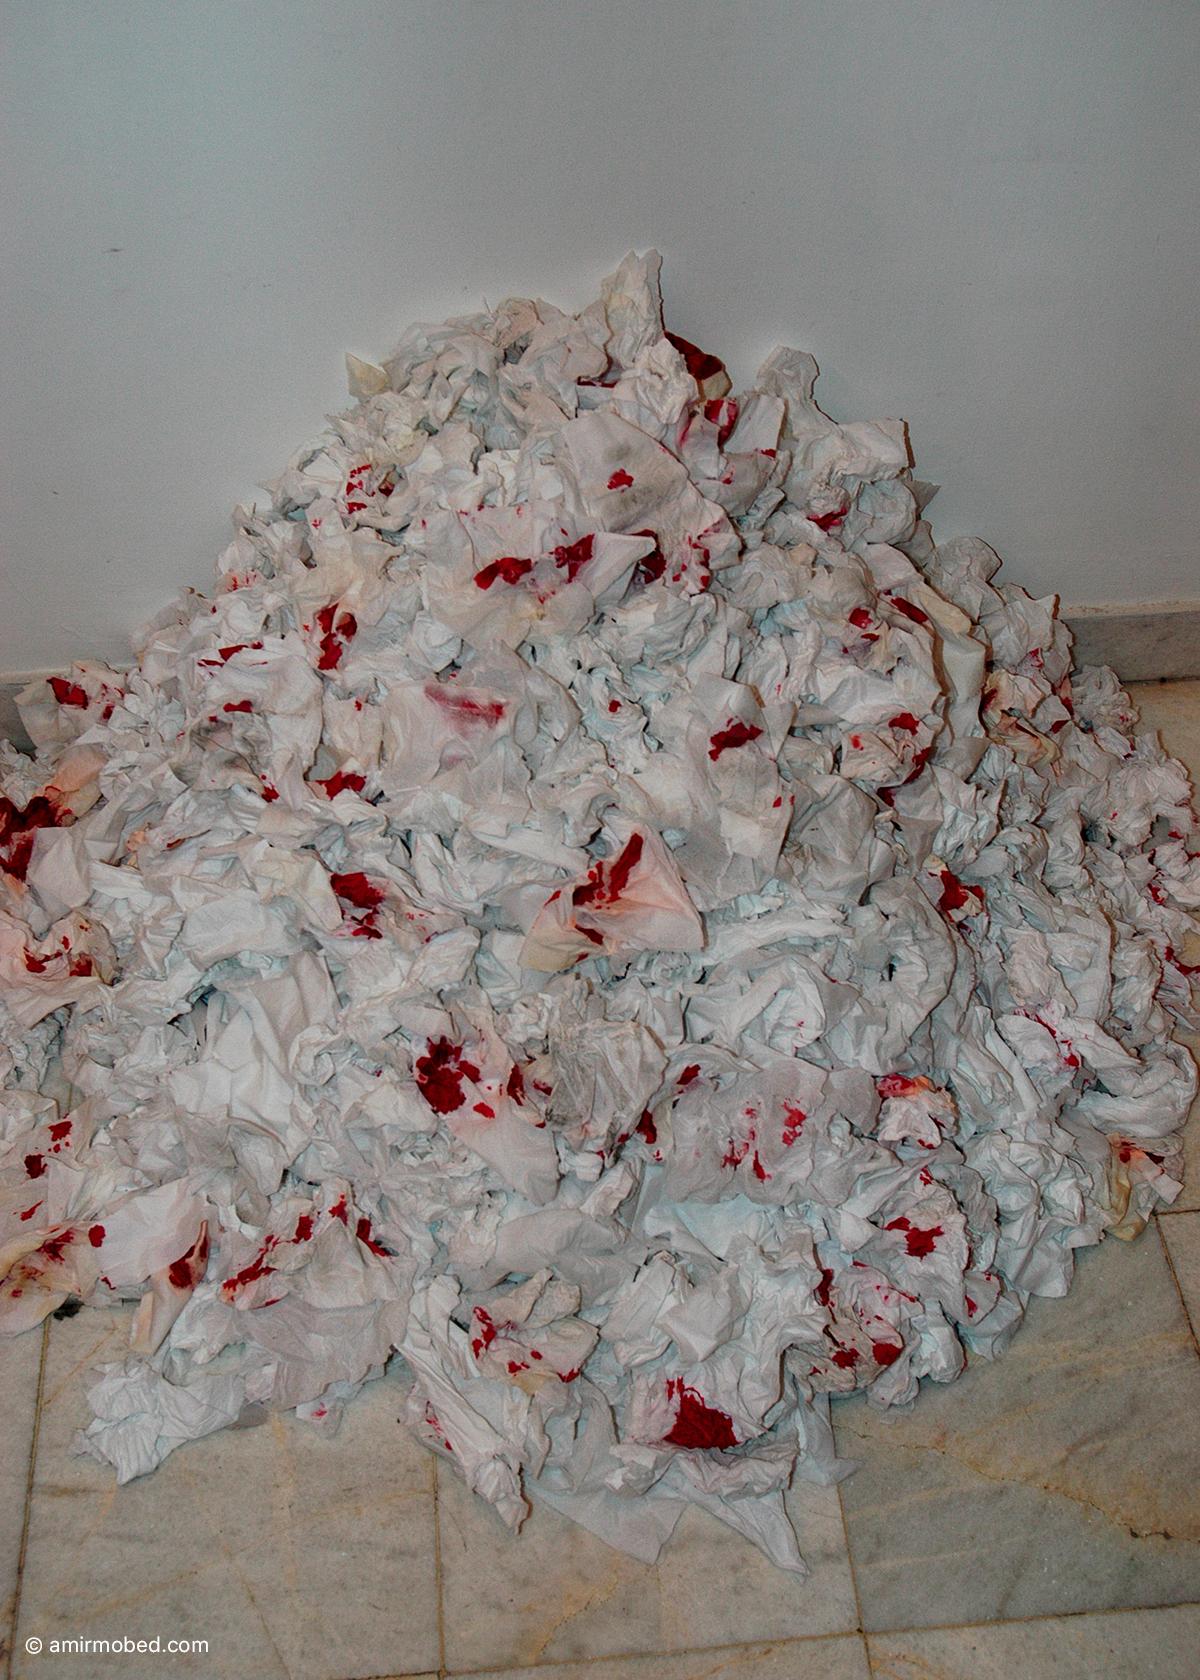 Virginity, 2005, Installation, Apples, white color spray, hair, tissues